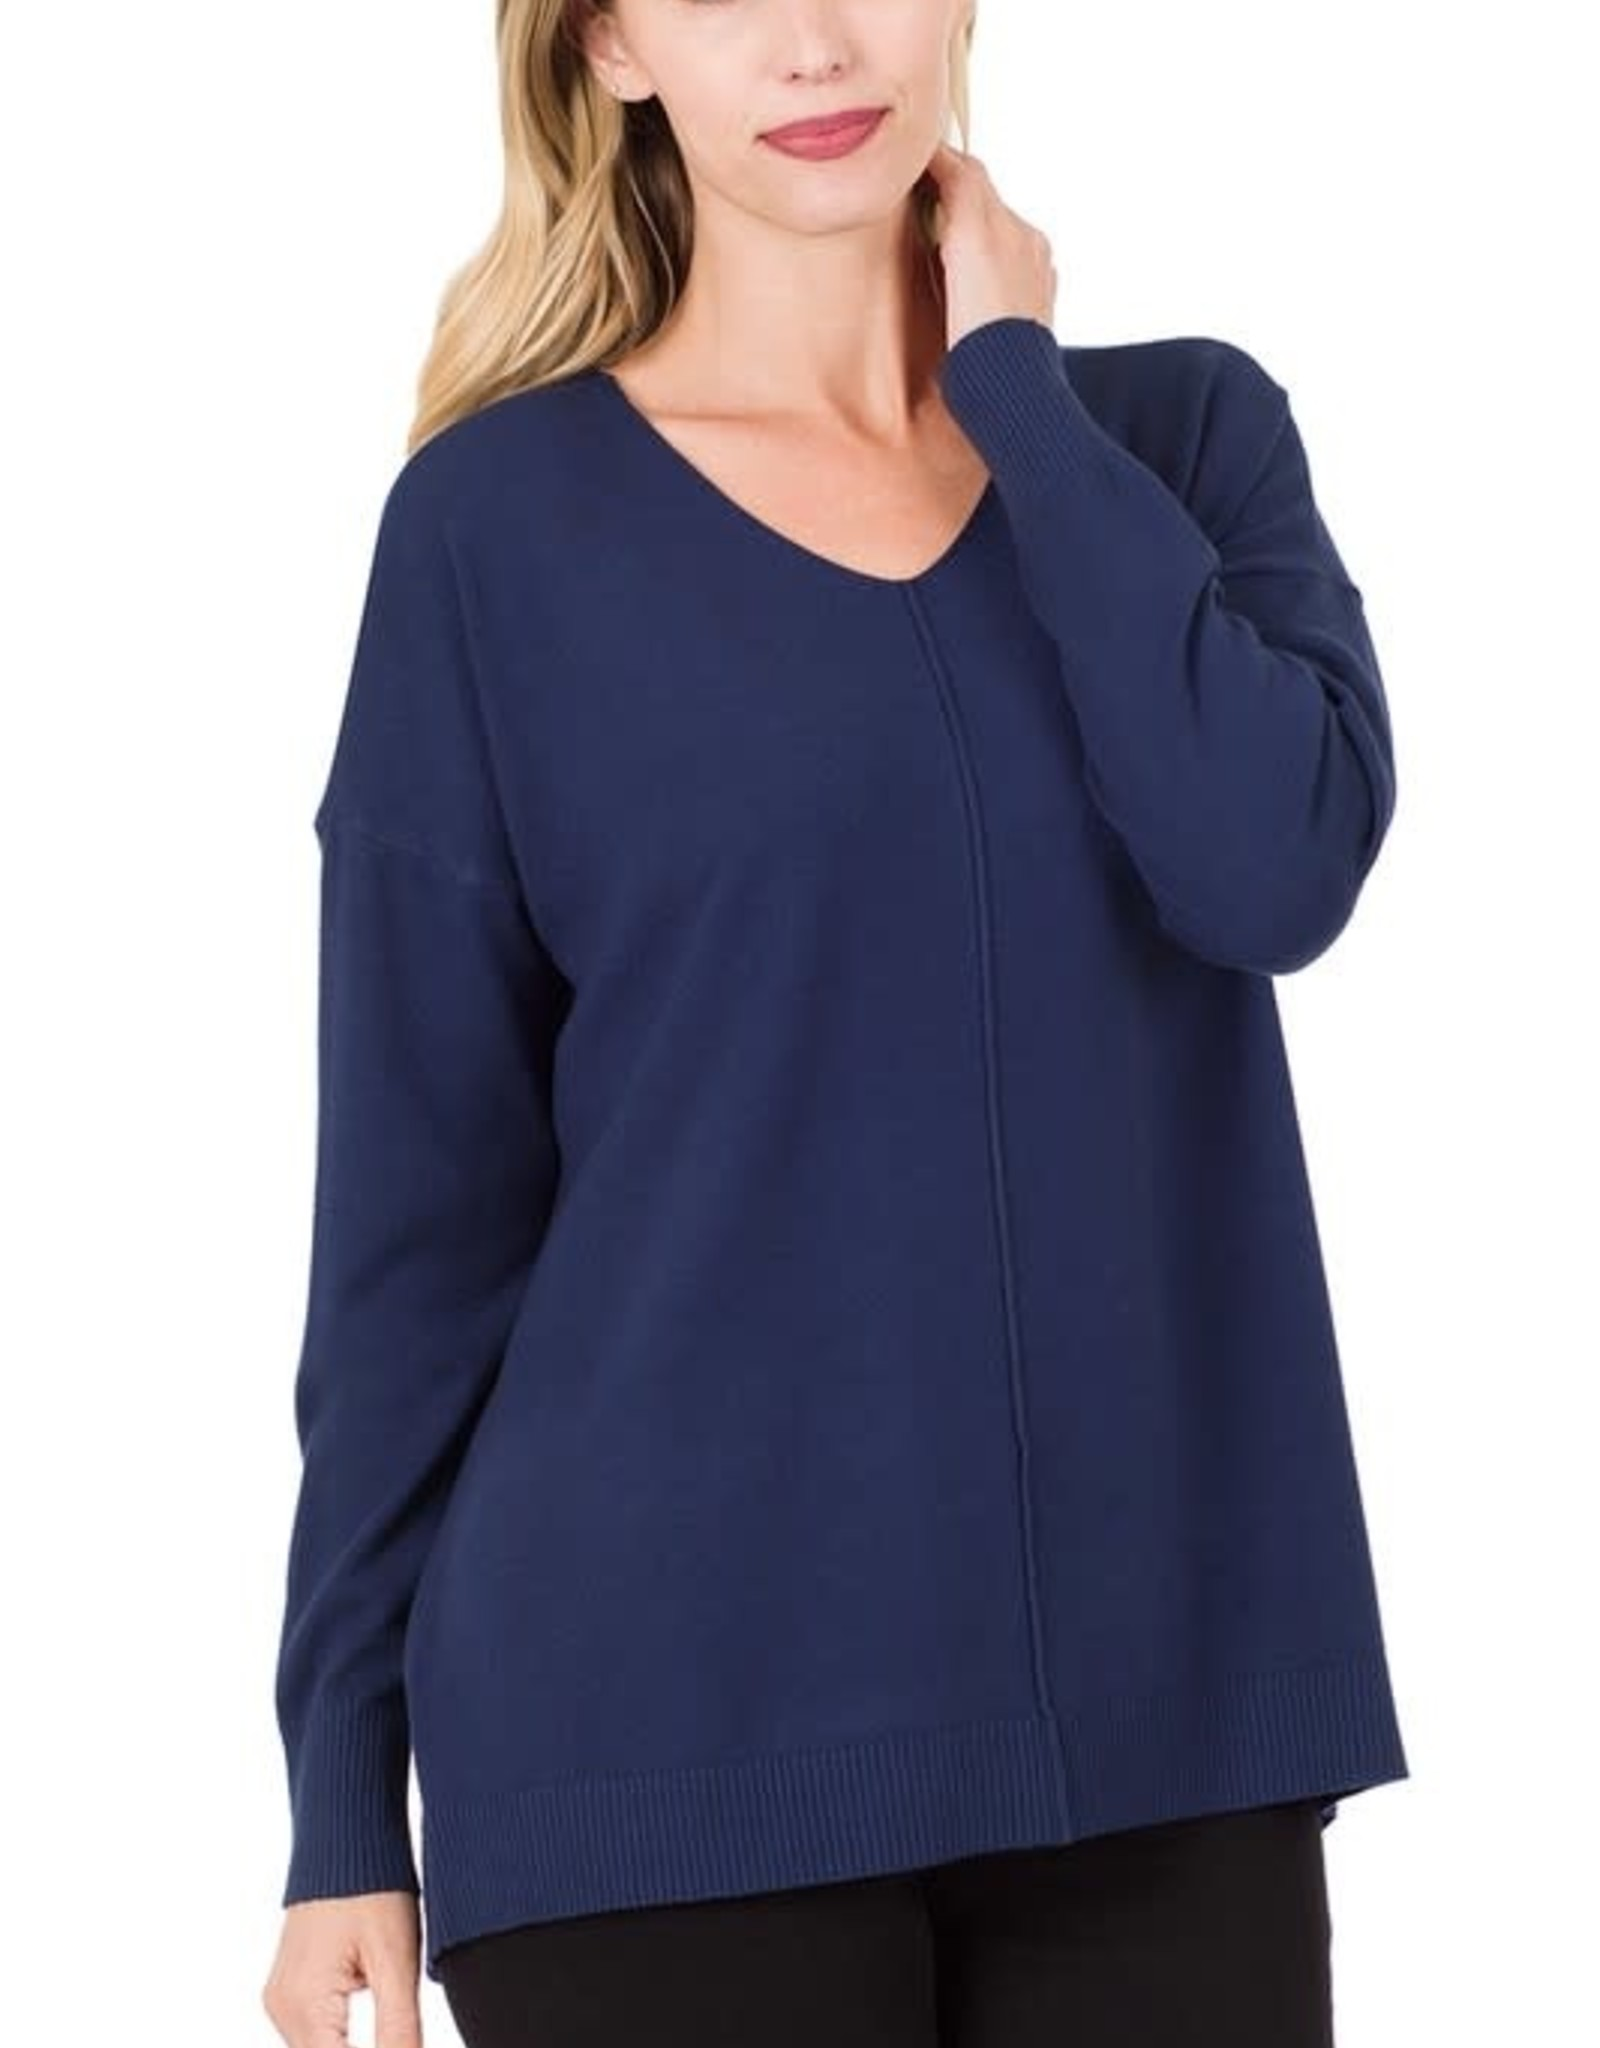 - Navy V-Neck Sweater w/ Center Seam